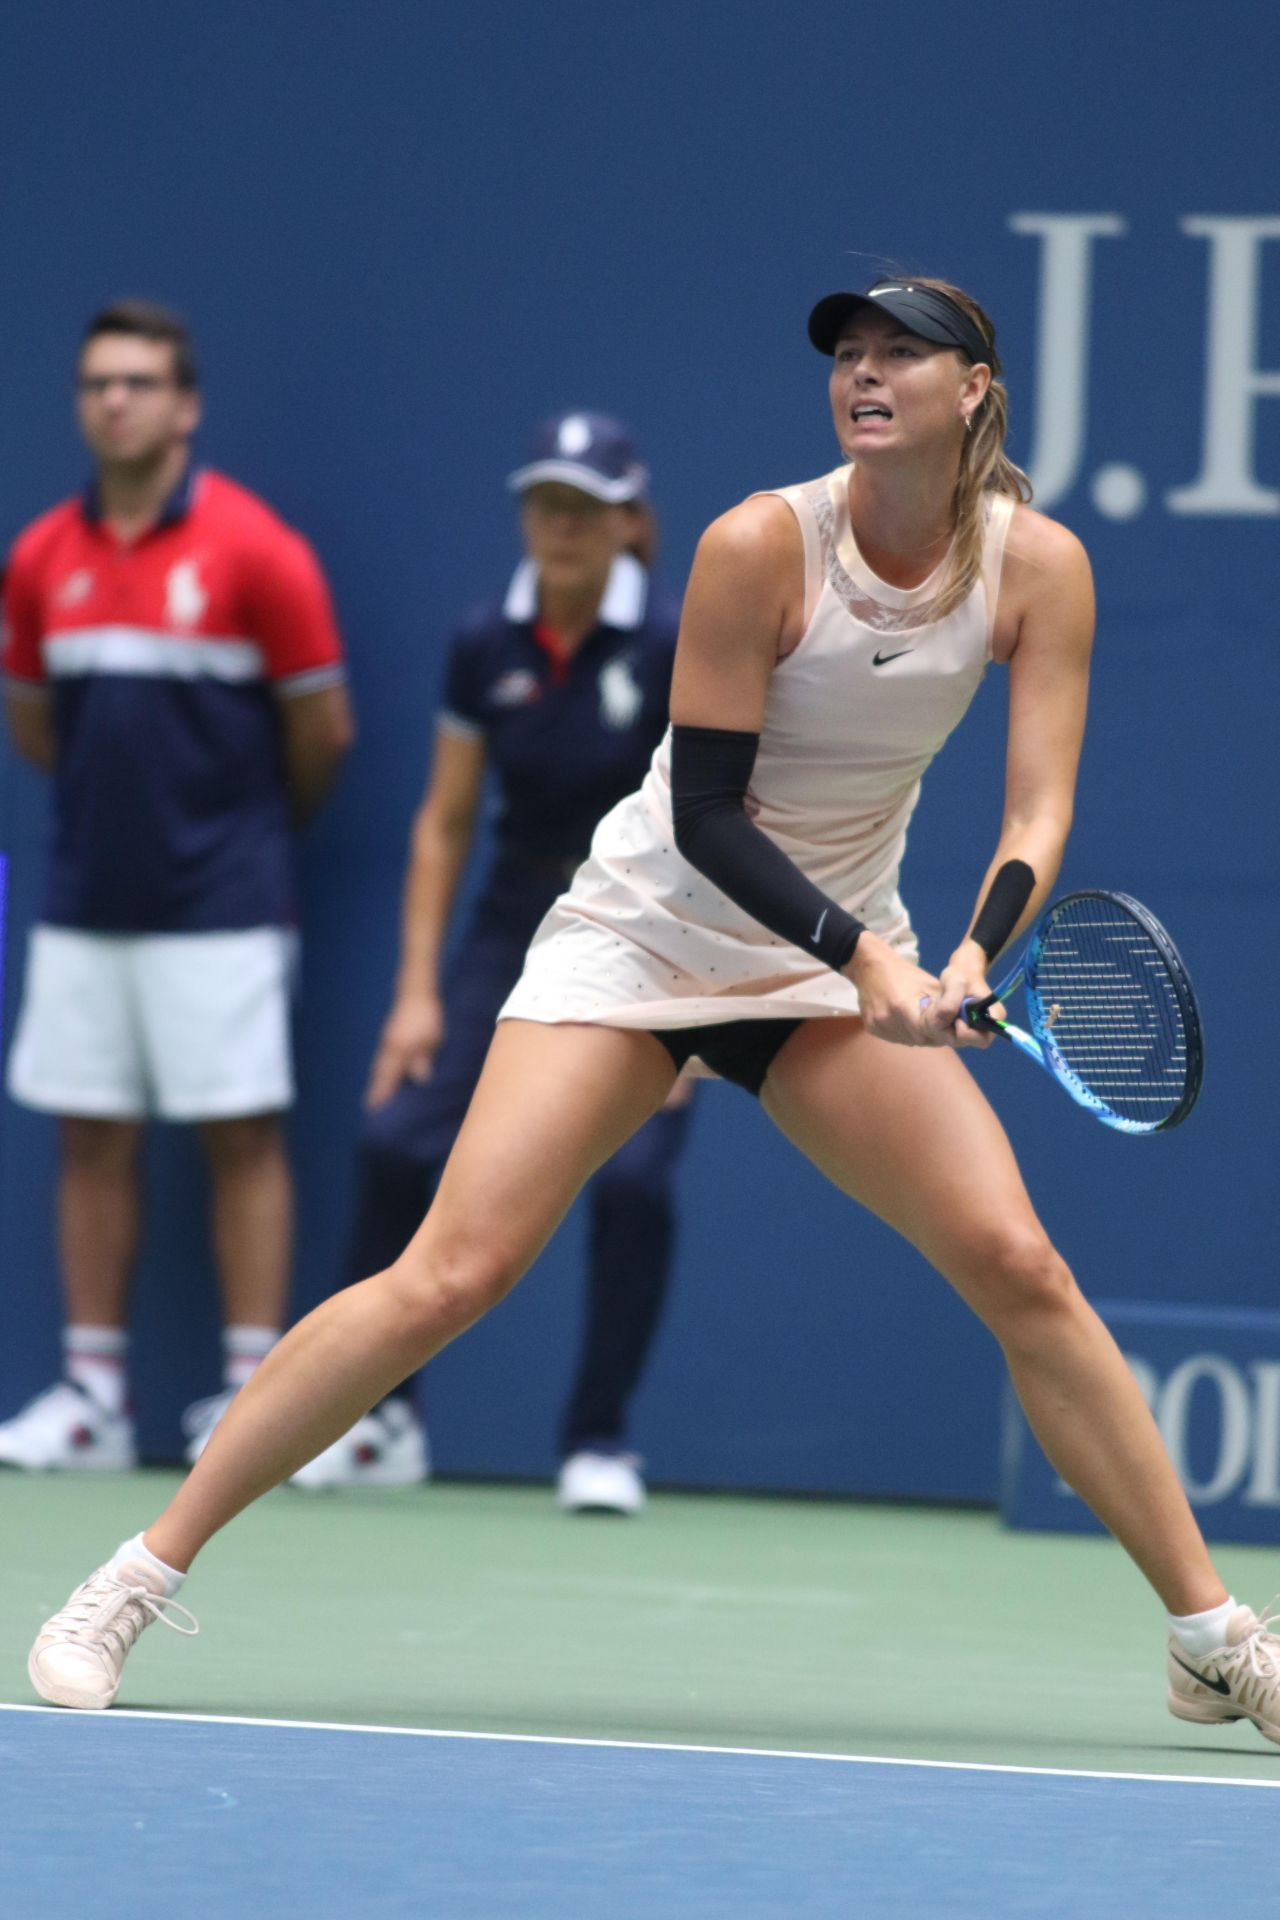 hottest female athletes panties